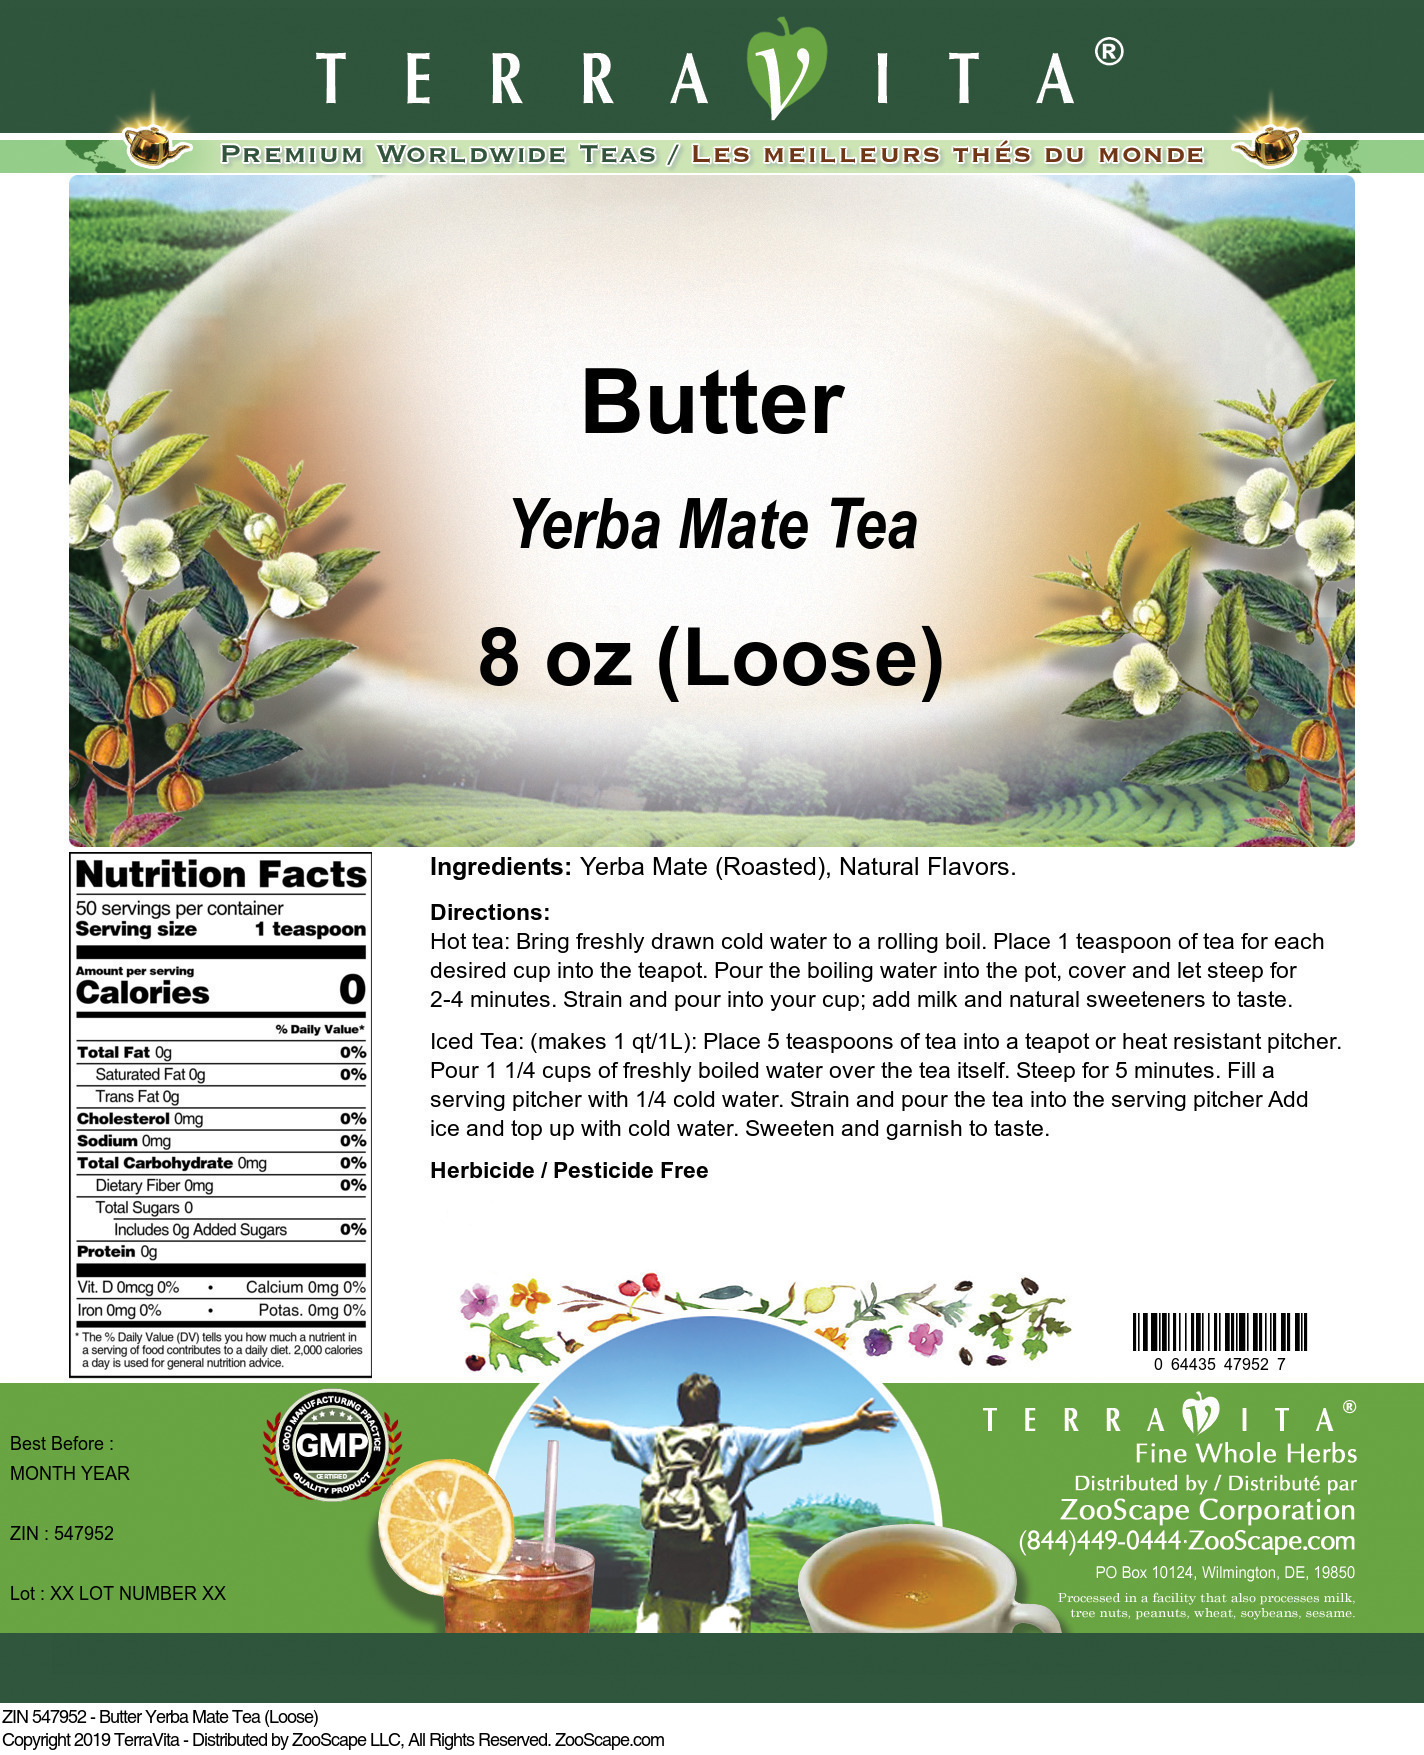 Butter Yerba Mate